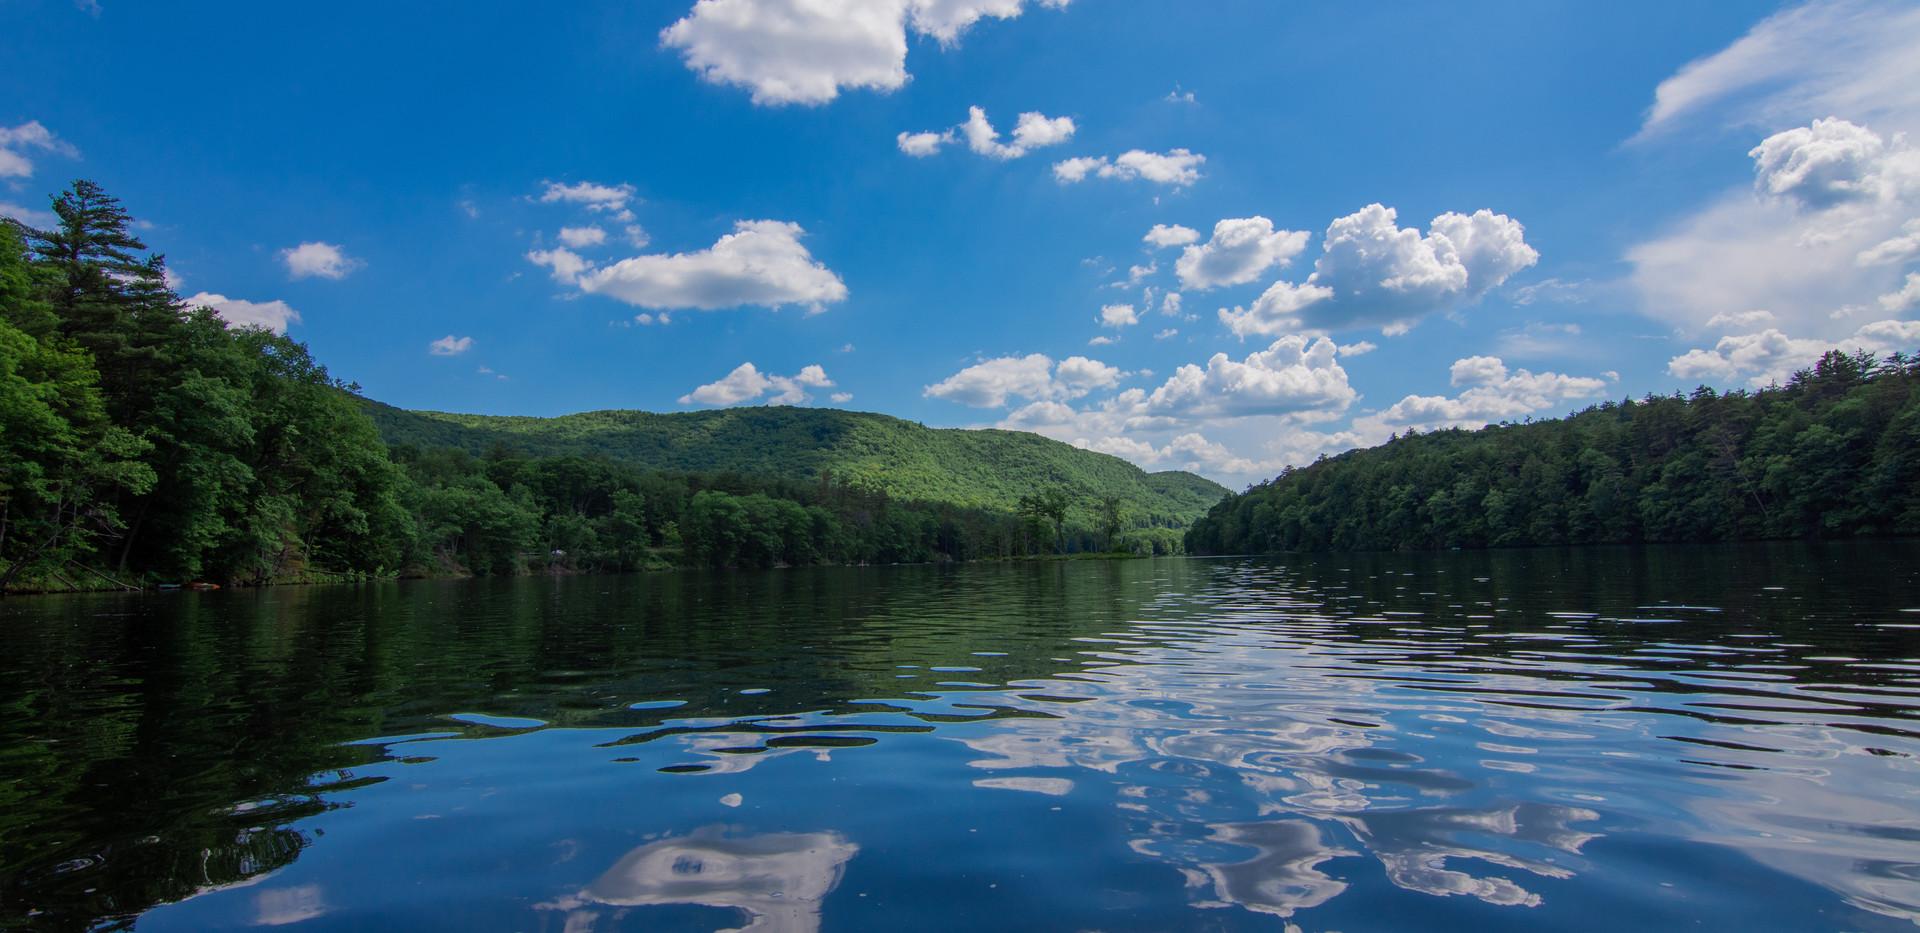 Adirondack Life Noxon Photography-4.jpg